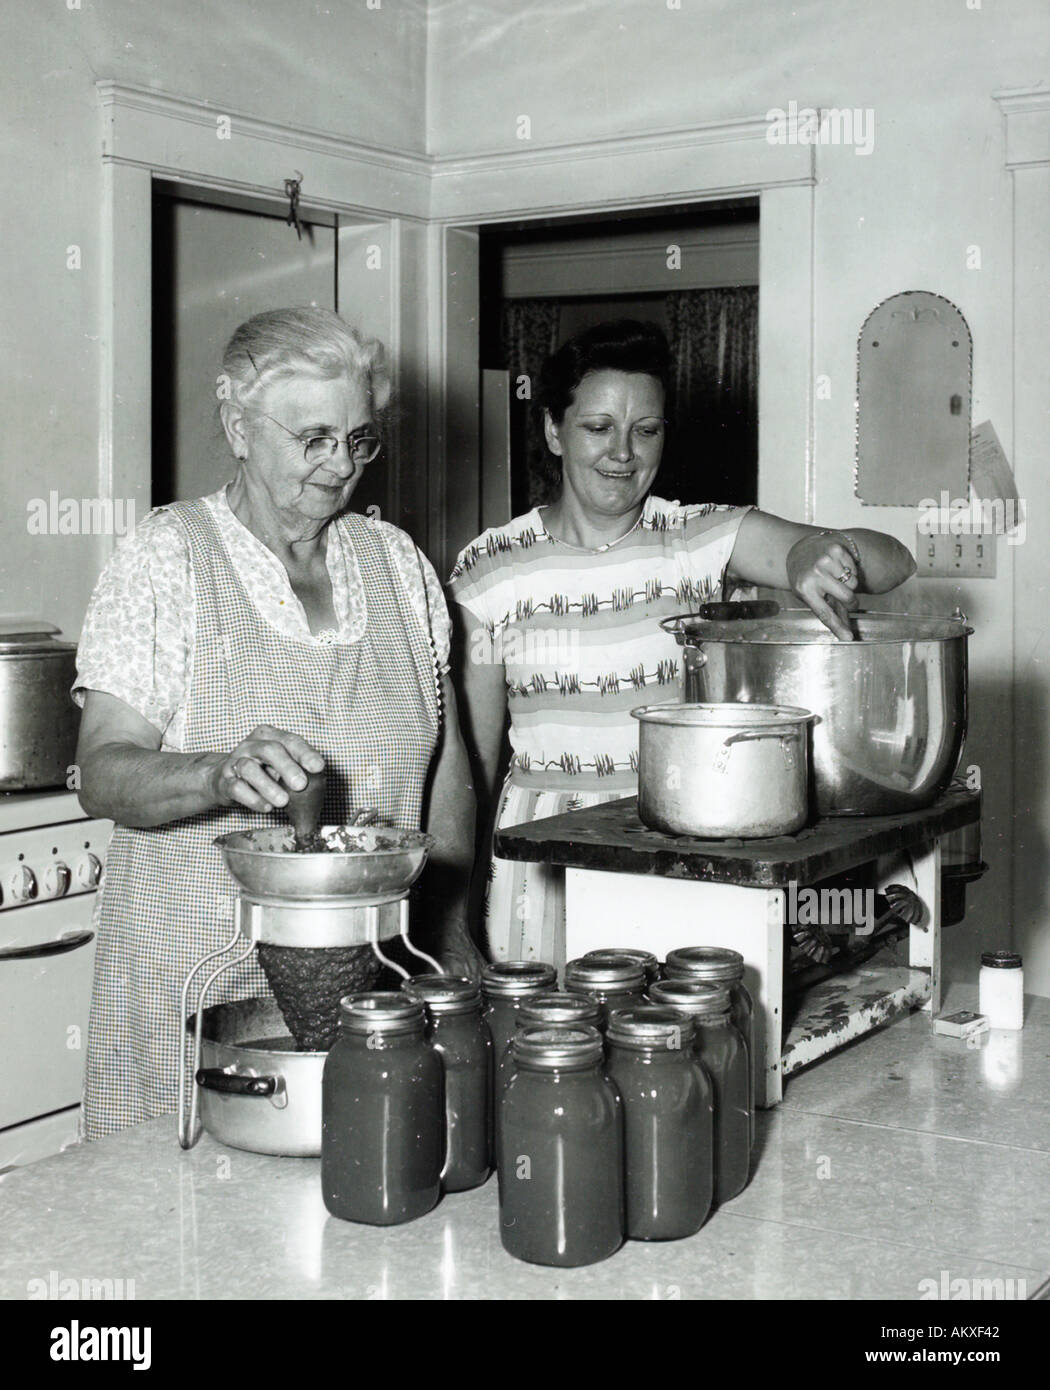 1950s kitchen stock photos 1950s kitchen stock images alamy